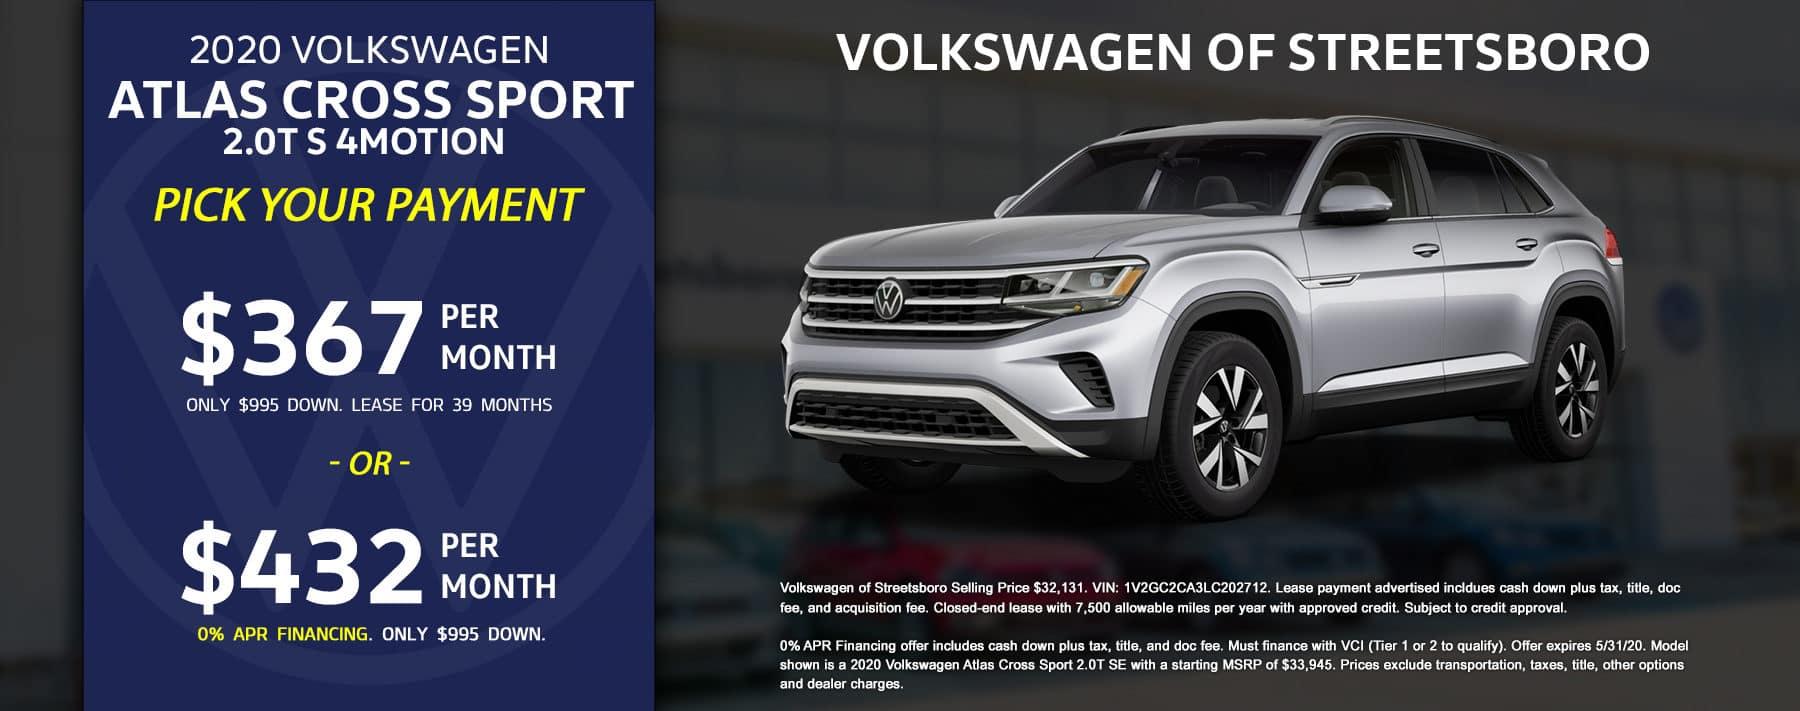 2020 VW CrossSport - May 2020